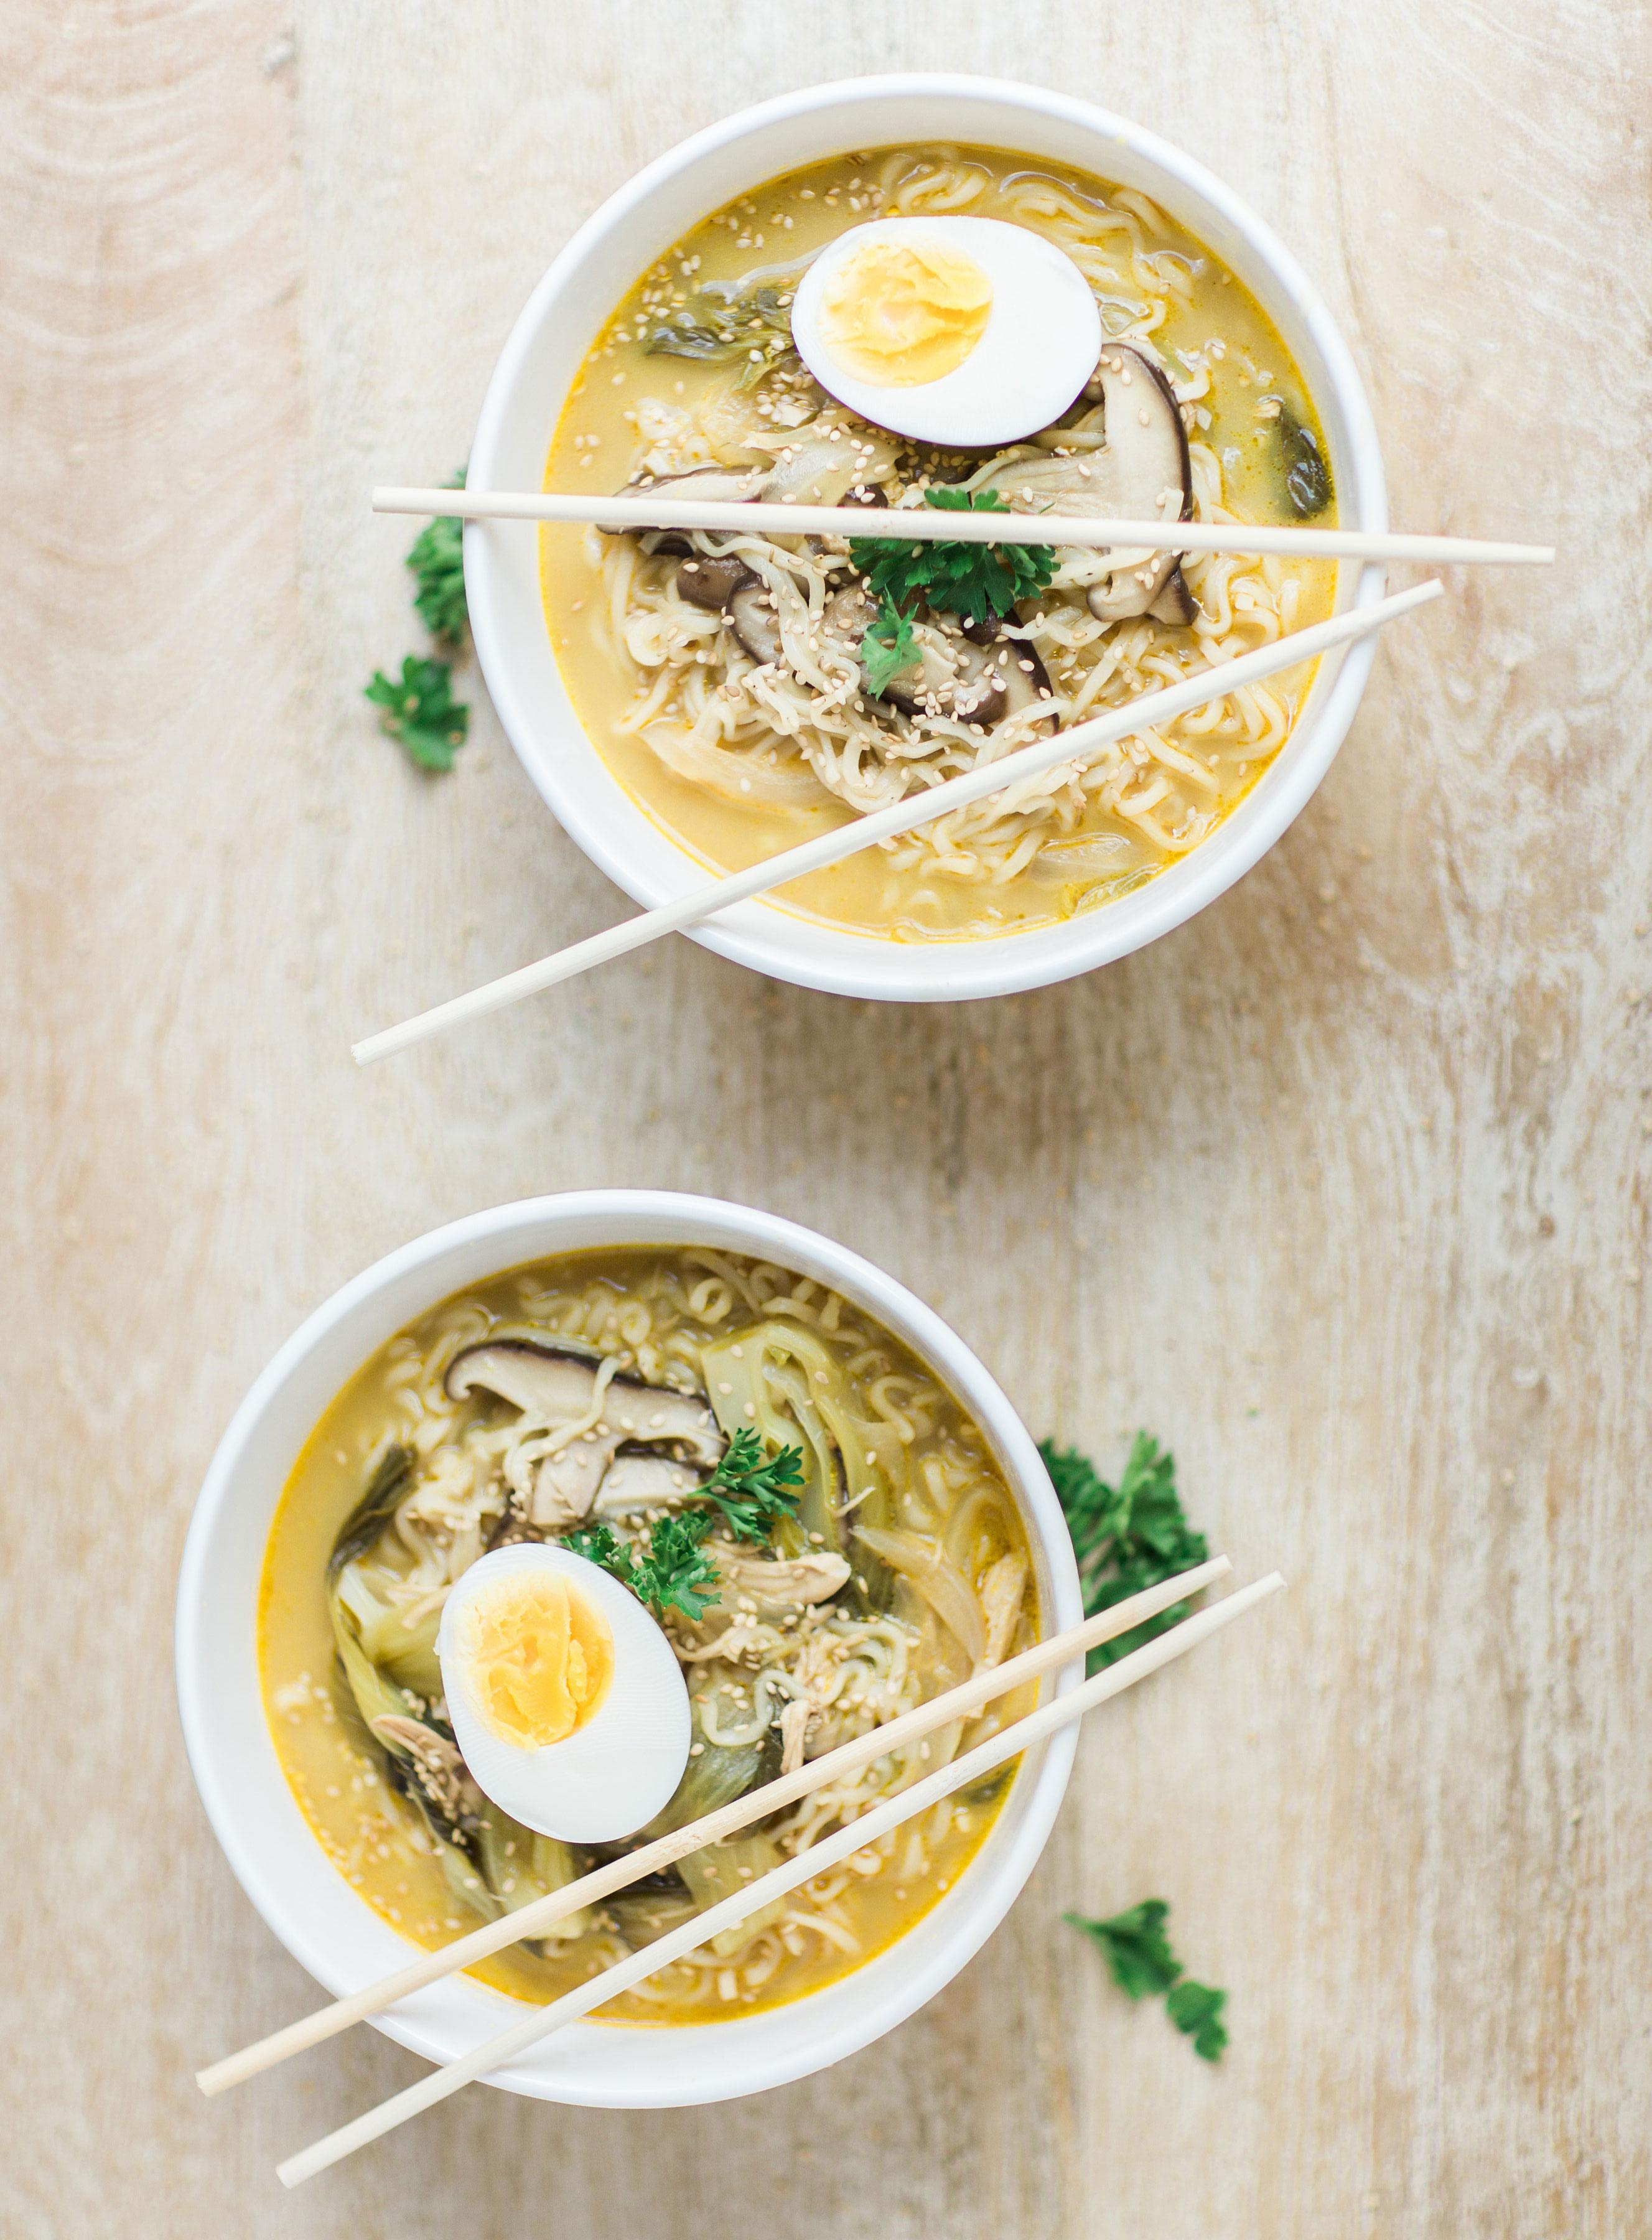 Simple Ramen Noodles Recipe in Under 15 Minutes